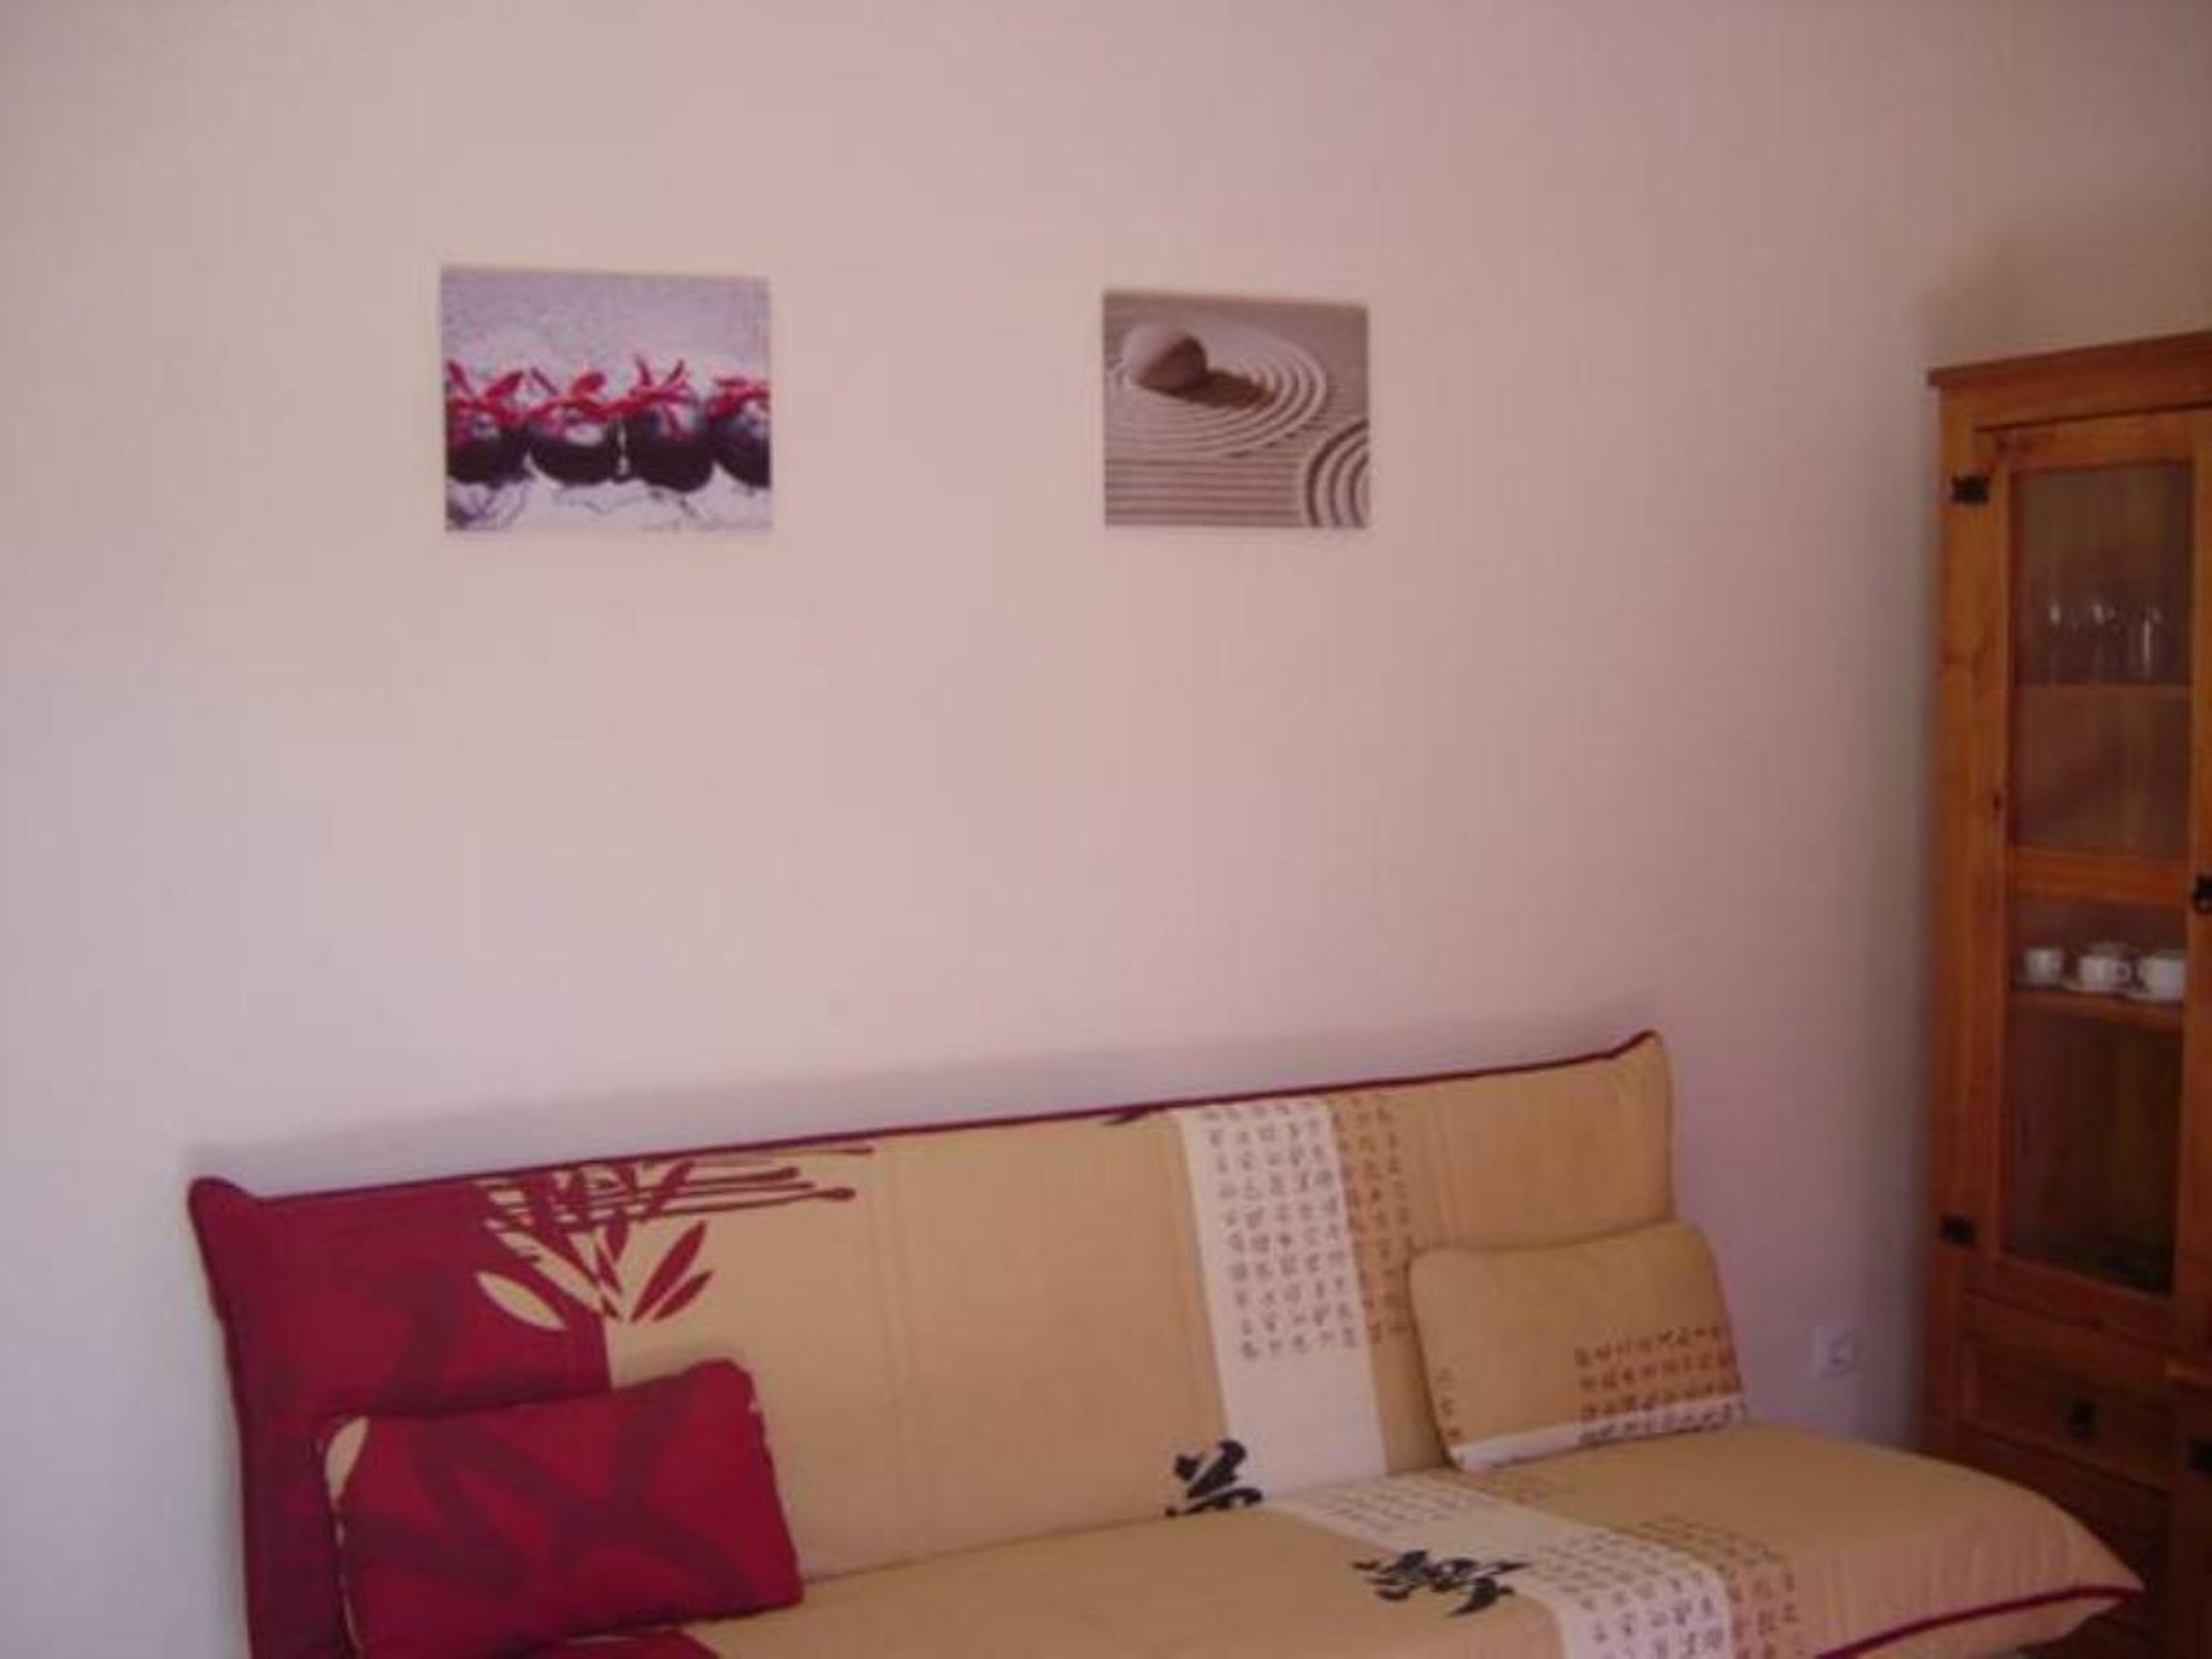 Ferienwohnung Wohnung El Mirador -Residencial Las Dunas - (2196686), Corralejo, Fuerteventura, Kanarische Inseln, Spanien, Bild 2